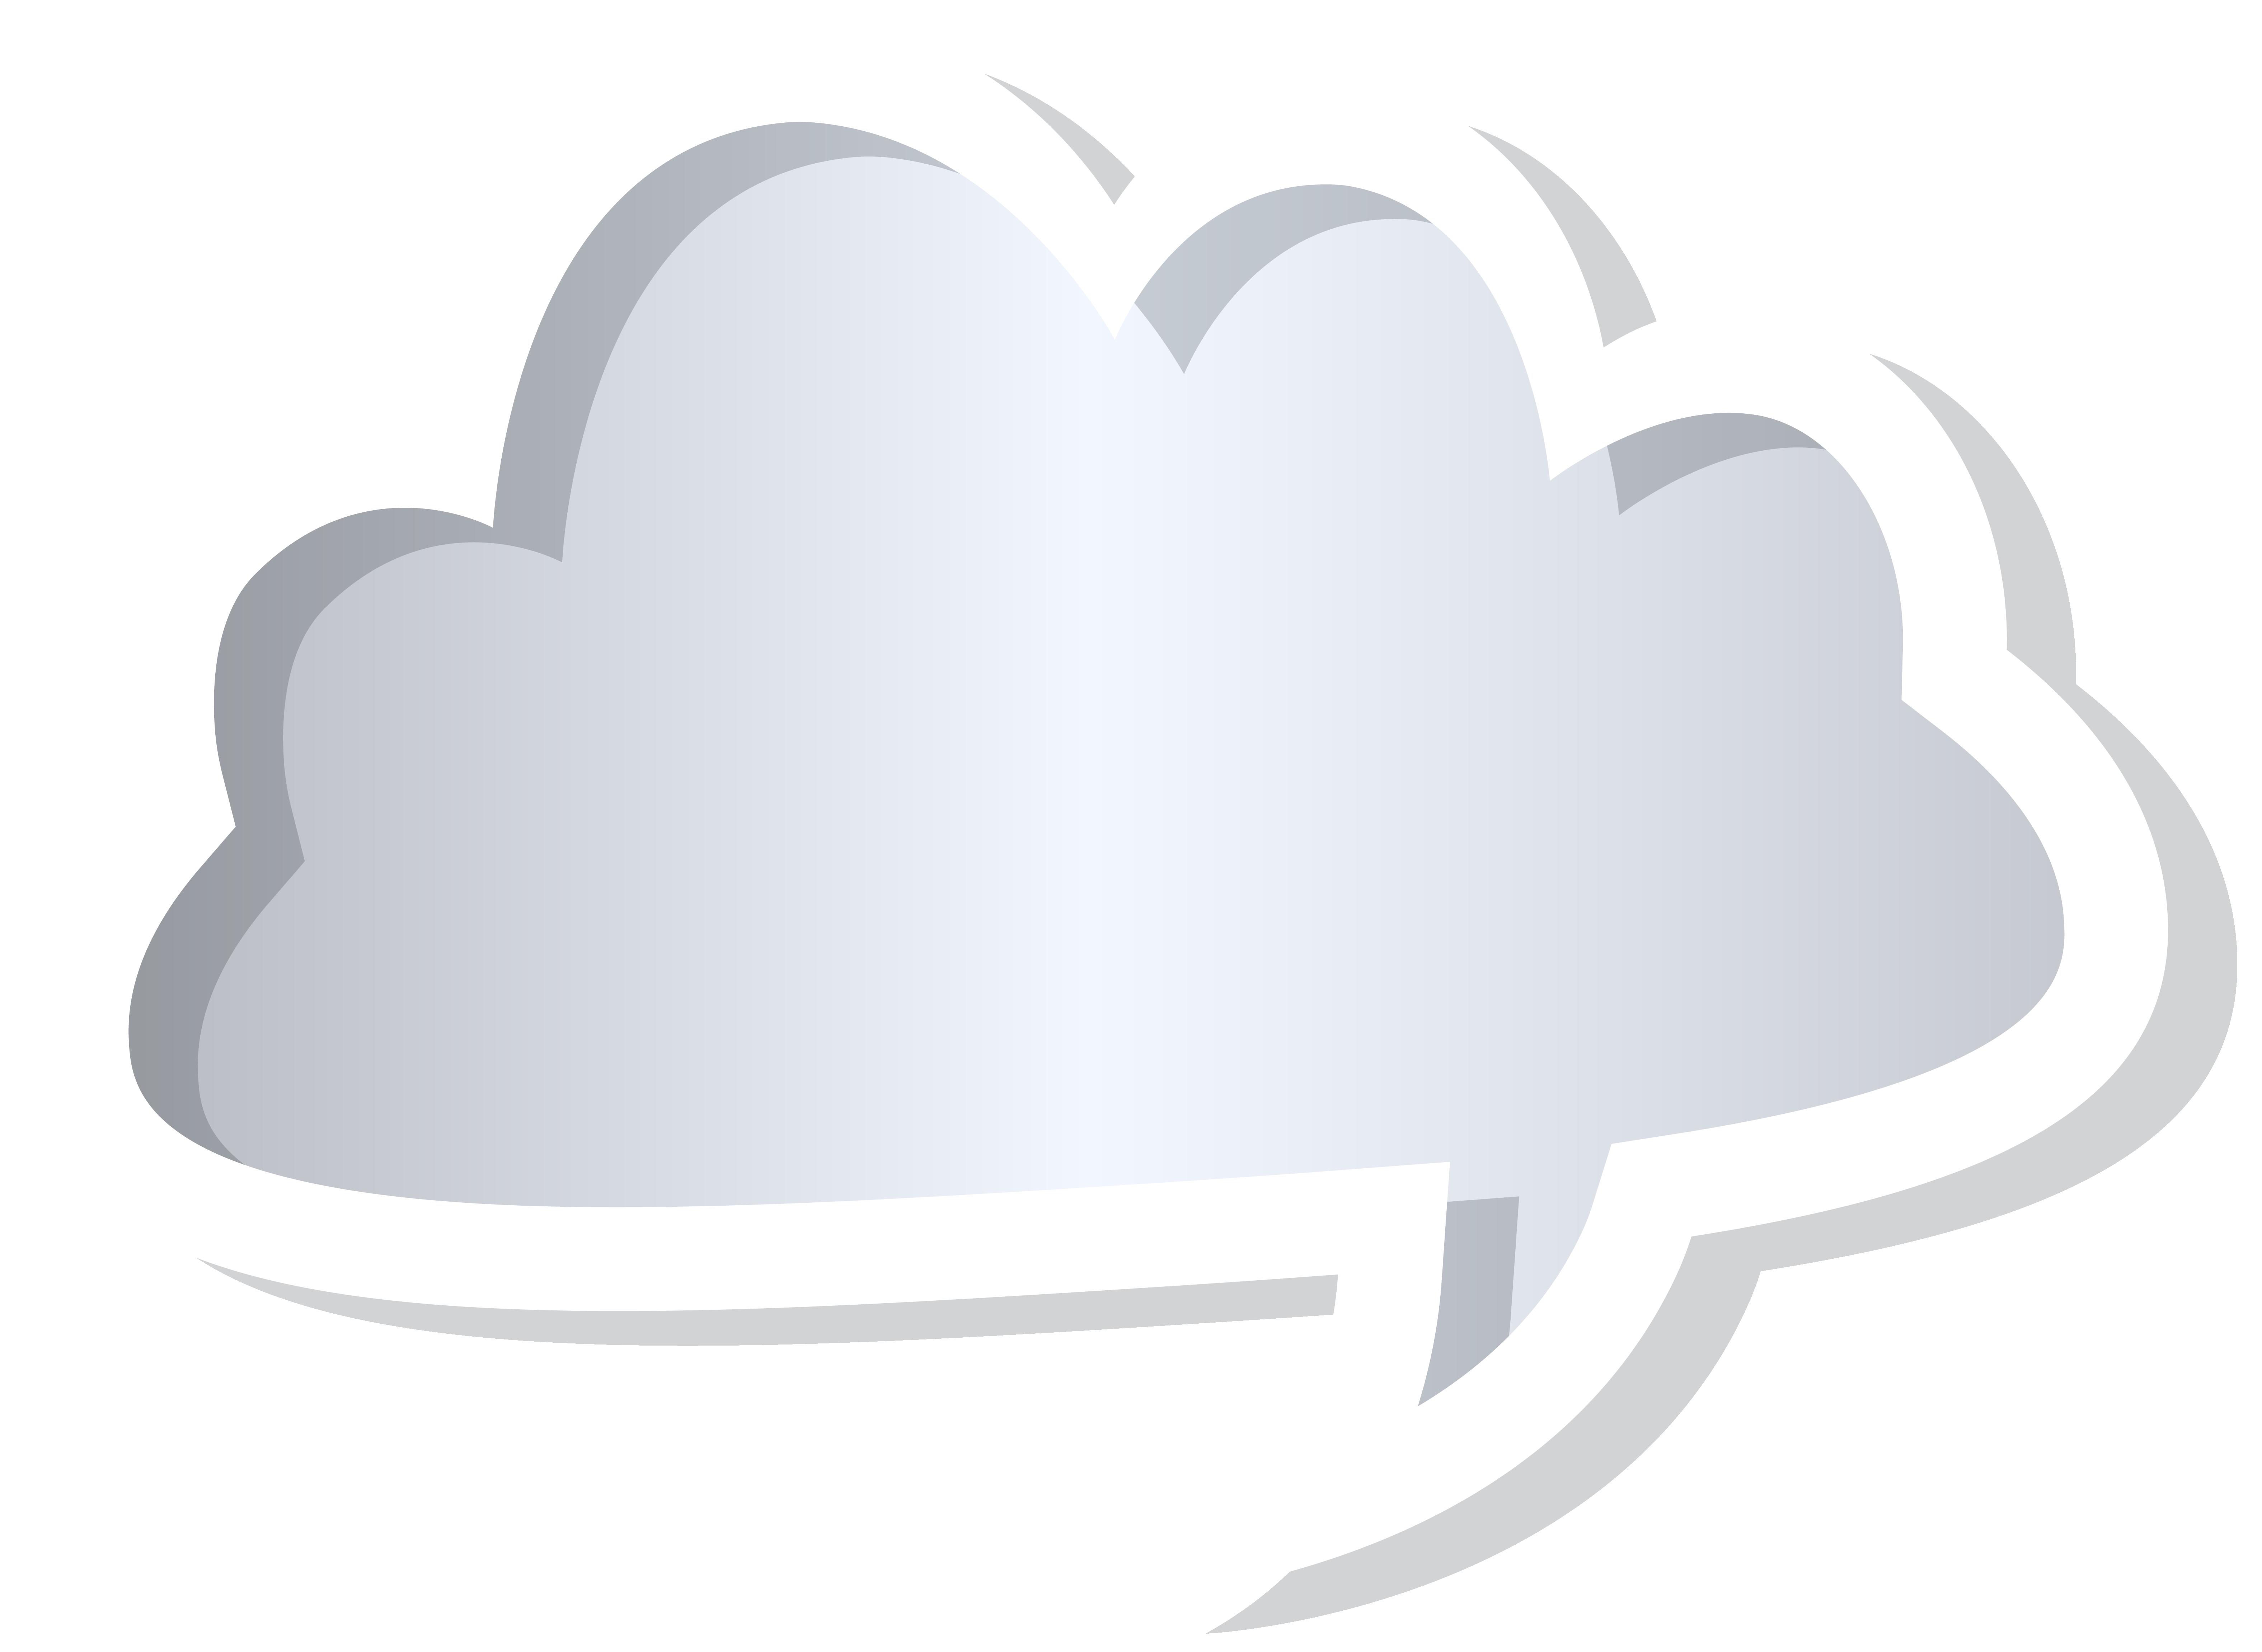 Bubble speech grey png. Cloud clipart heart